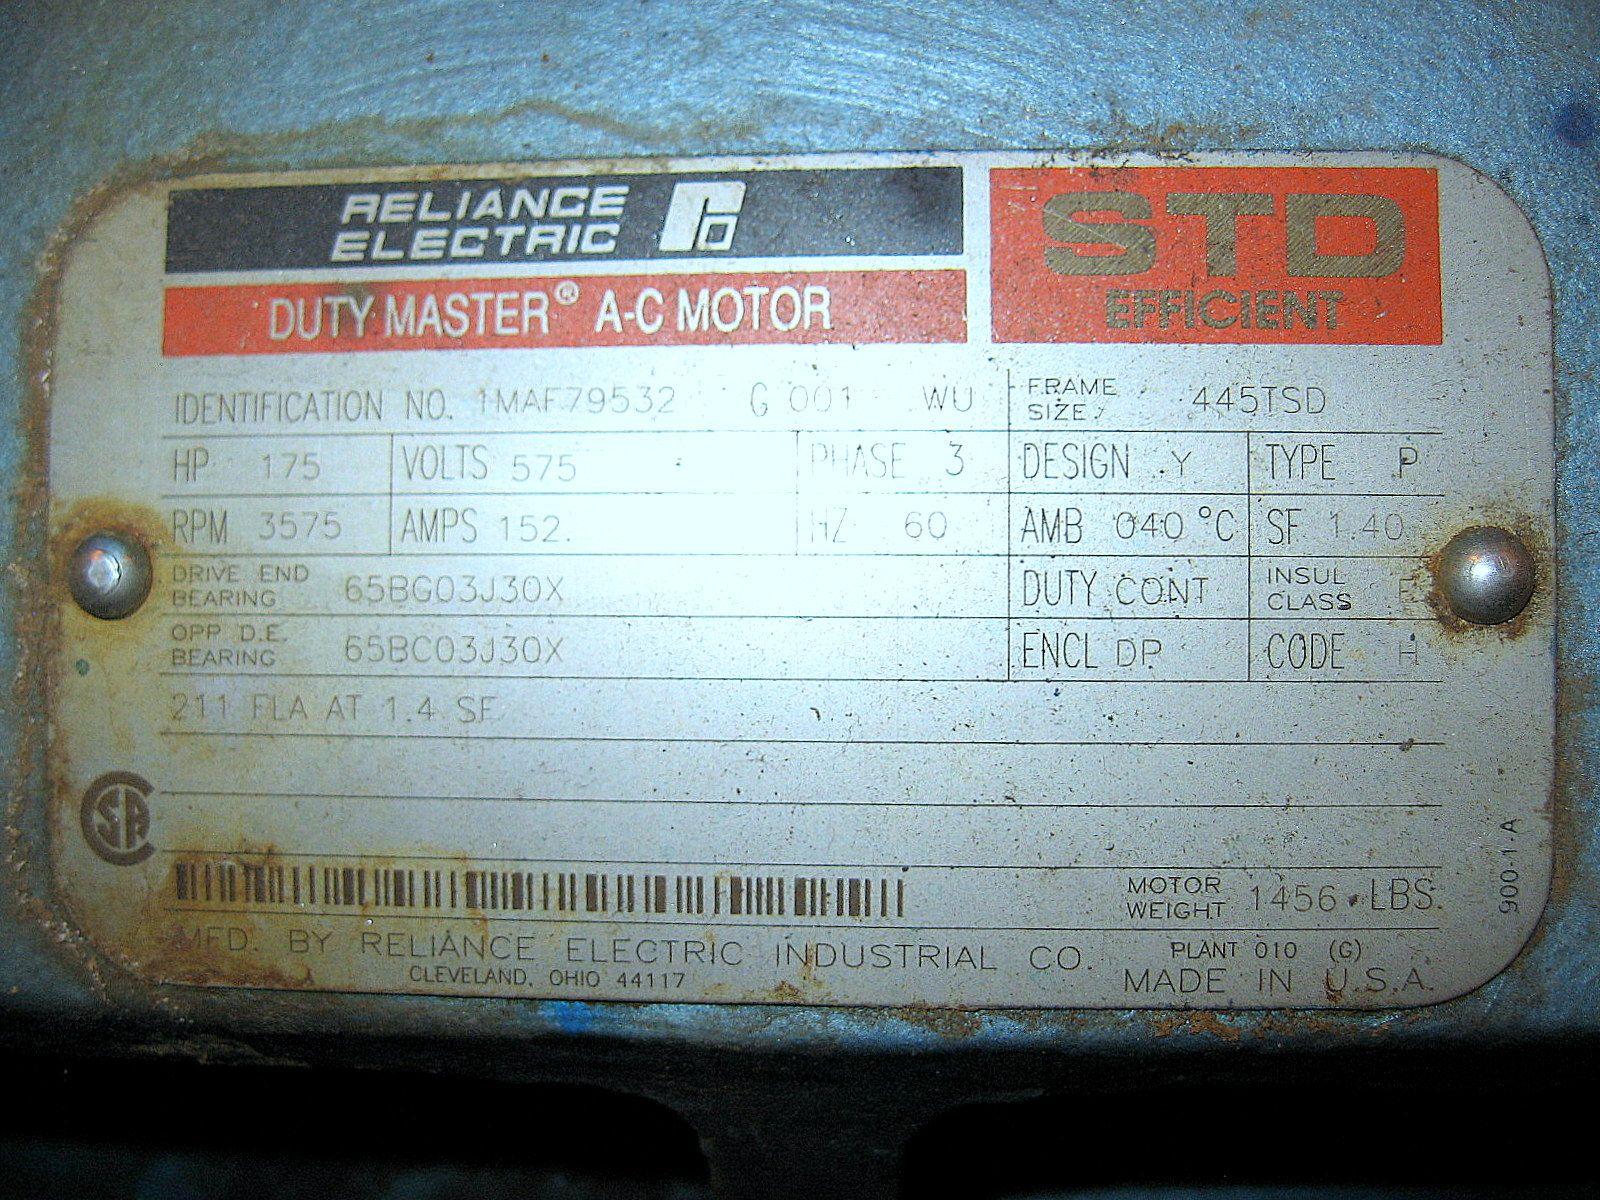 AIR COMPRESSOR - INGERSOLL RAND OCV6M2 - 175 HP - 626 CFM